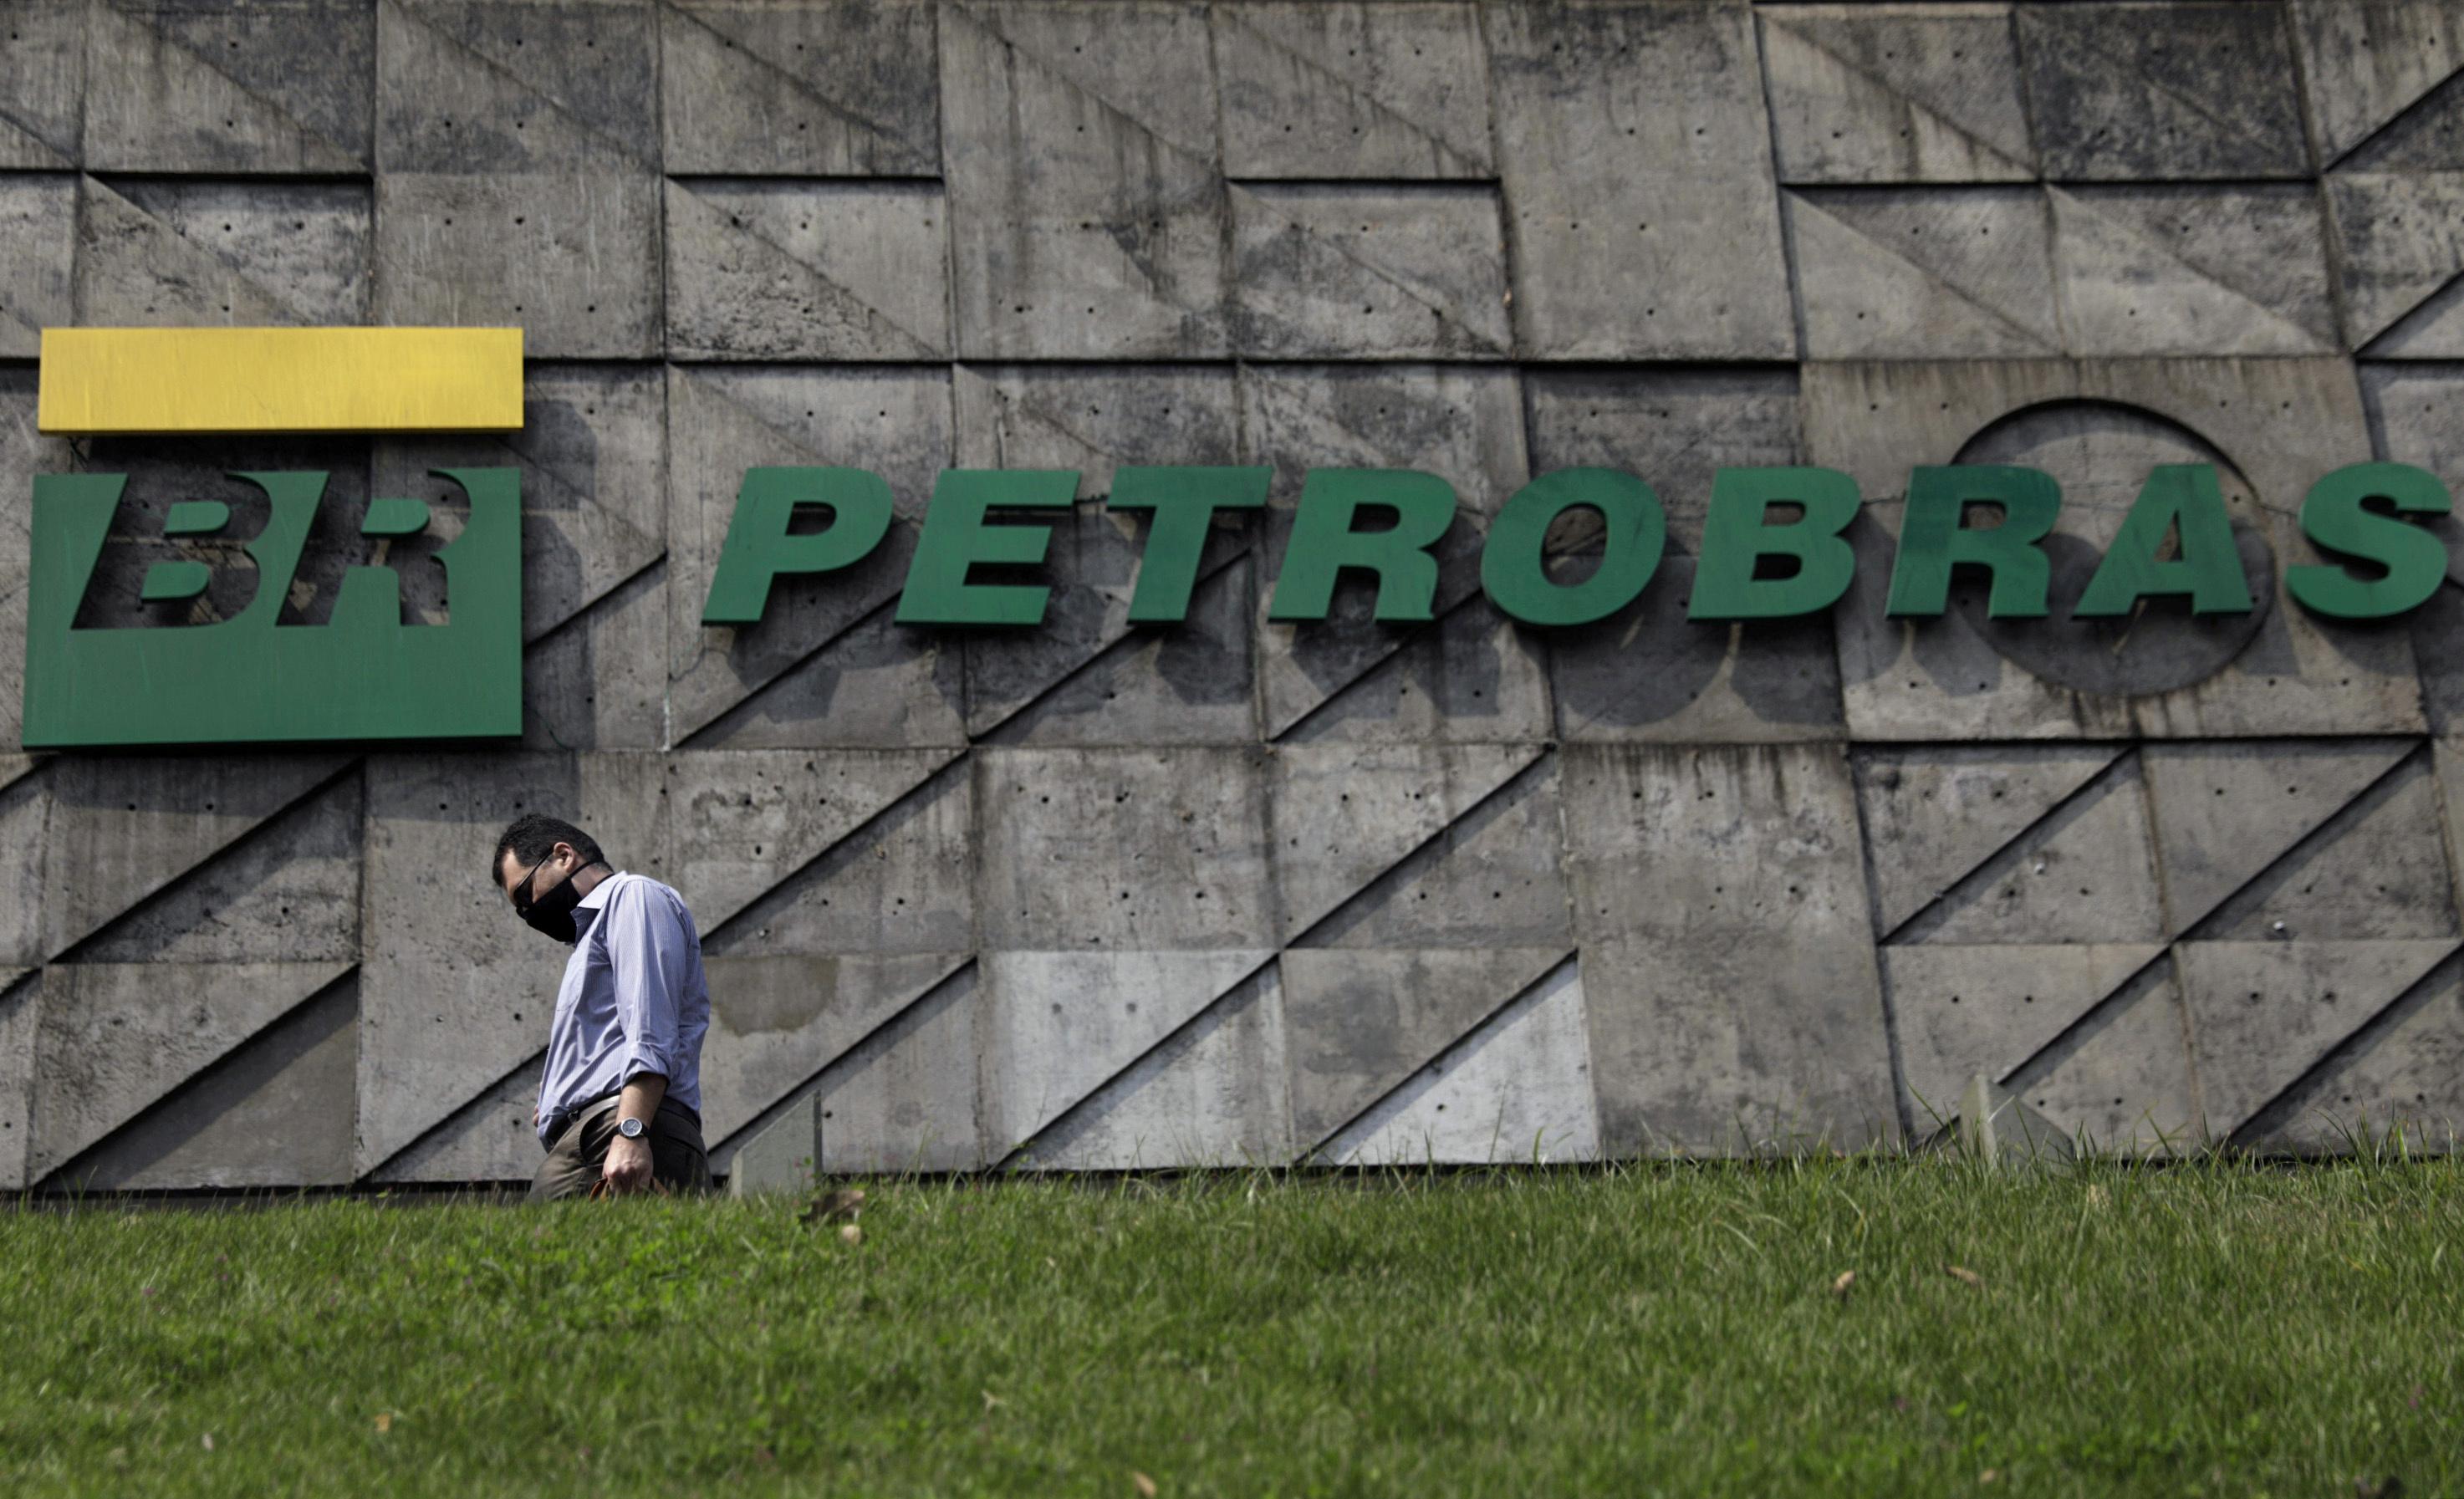 A man walks past the headquarters of Brazilian oil company Petrobras in Rio de Janeiro, Brazil, September 10, 2020. REUTERS/Ricardo Moraes/File Photo